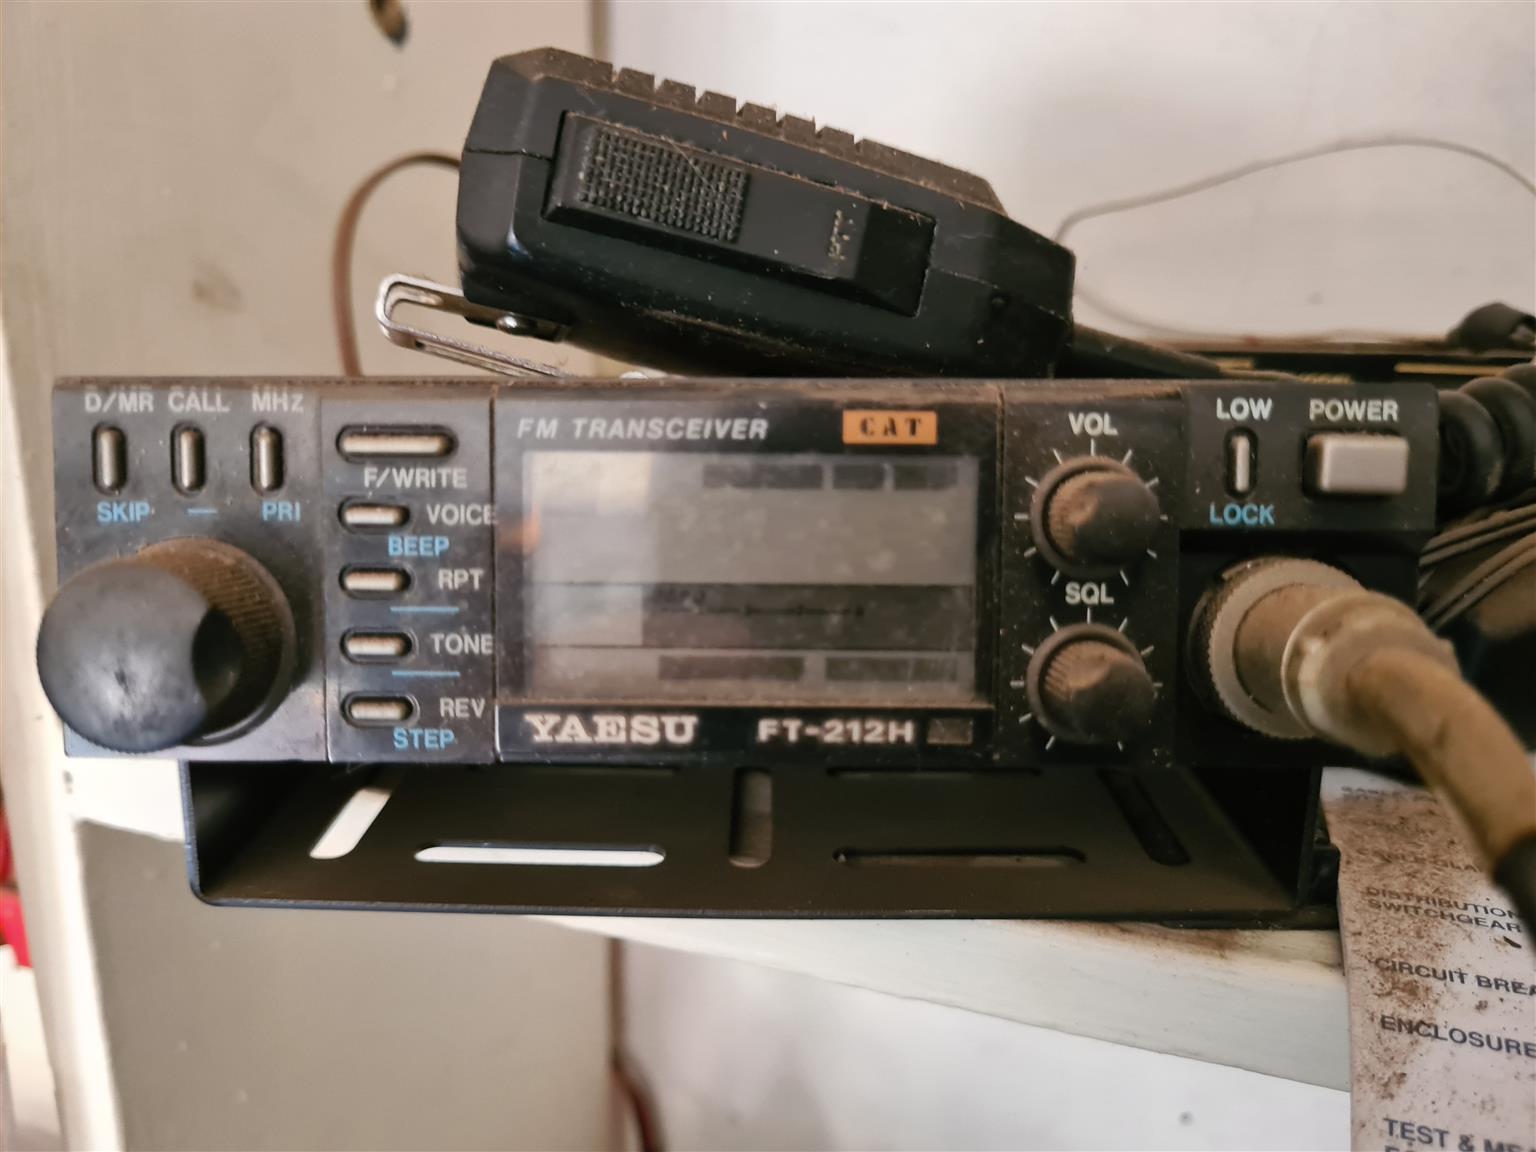 Yaesu FT-212H Transceiver 2m